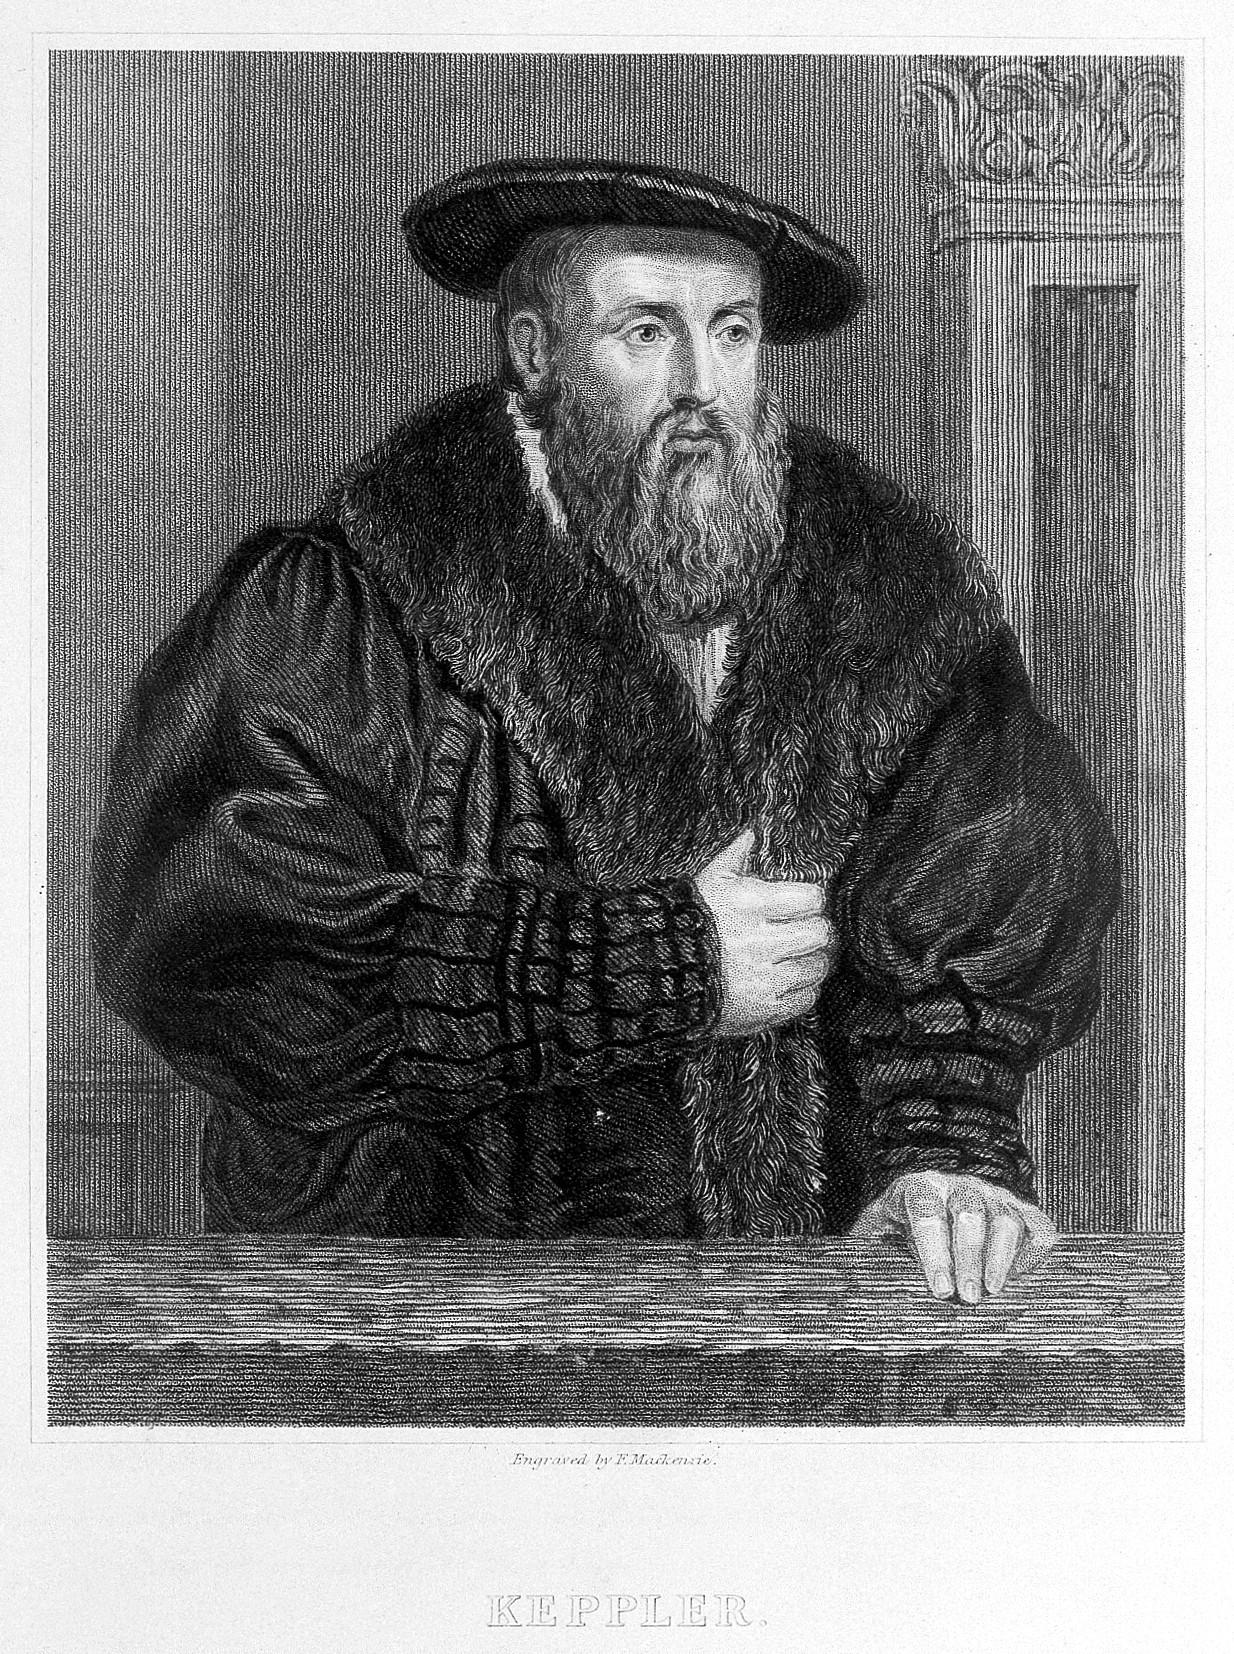 Johann_Kepler._Line_engraving_by_F._Mackenzie._Wellcome_L0010324